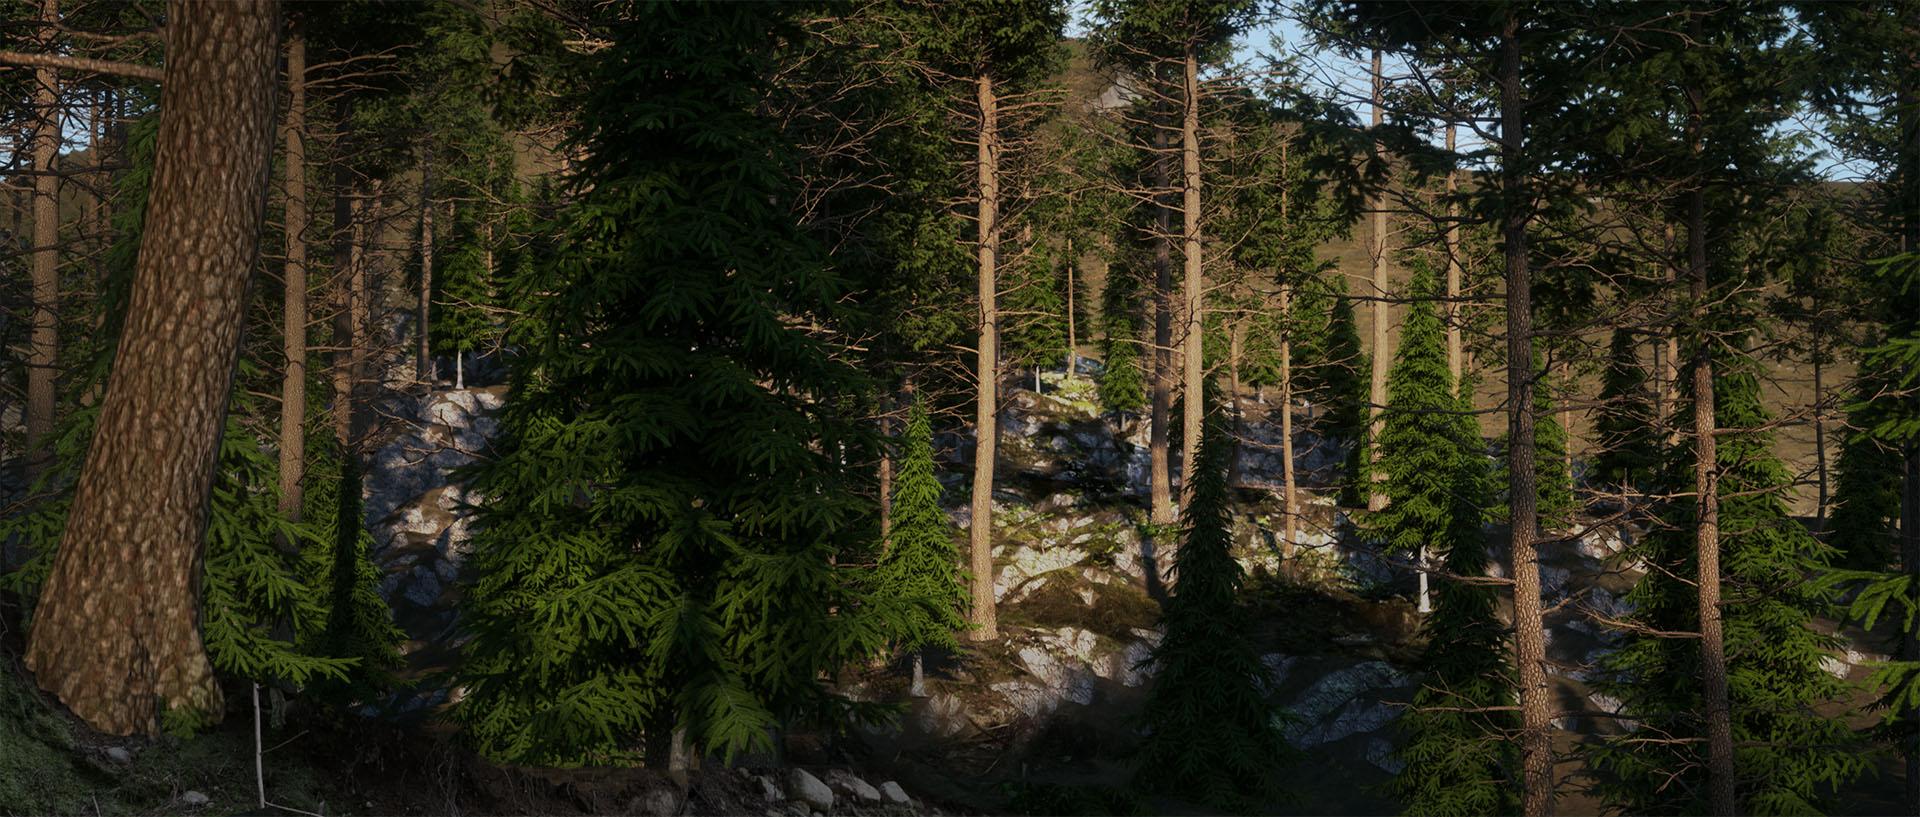 181227 Forest 2.jpg